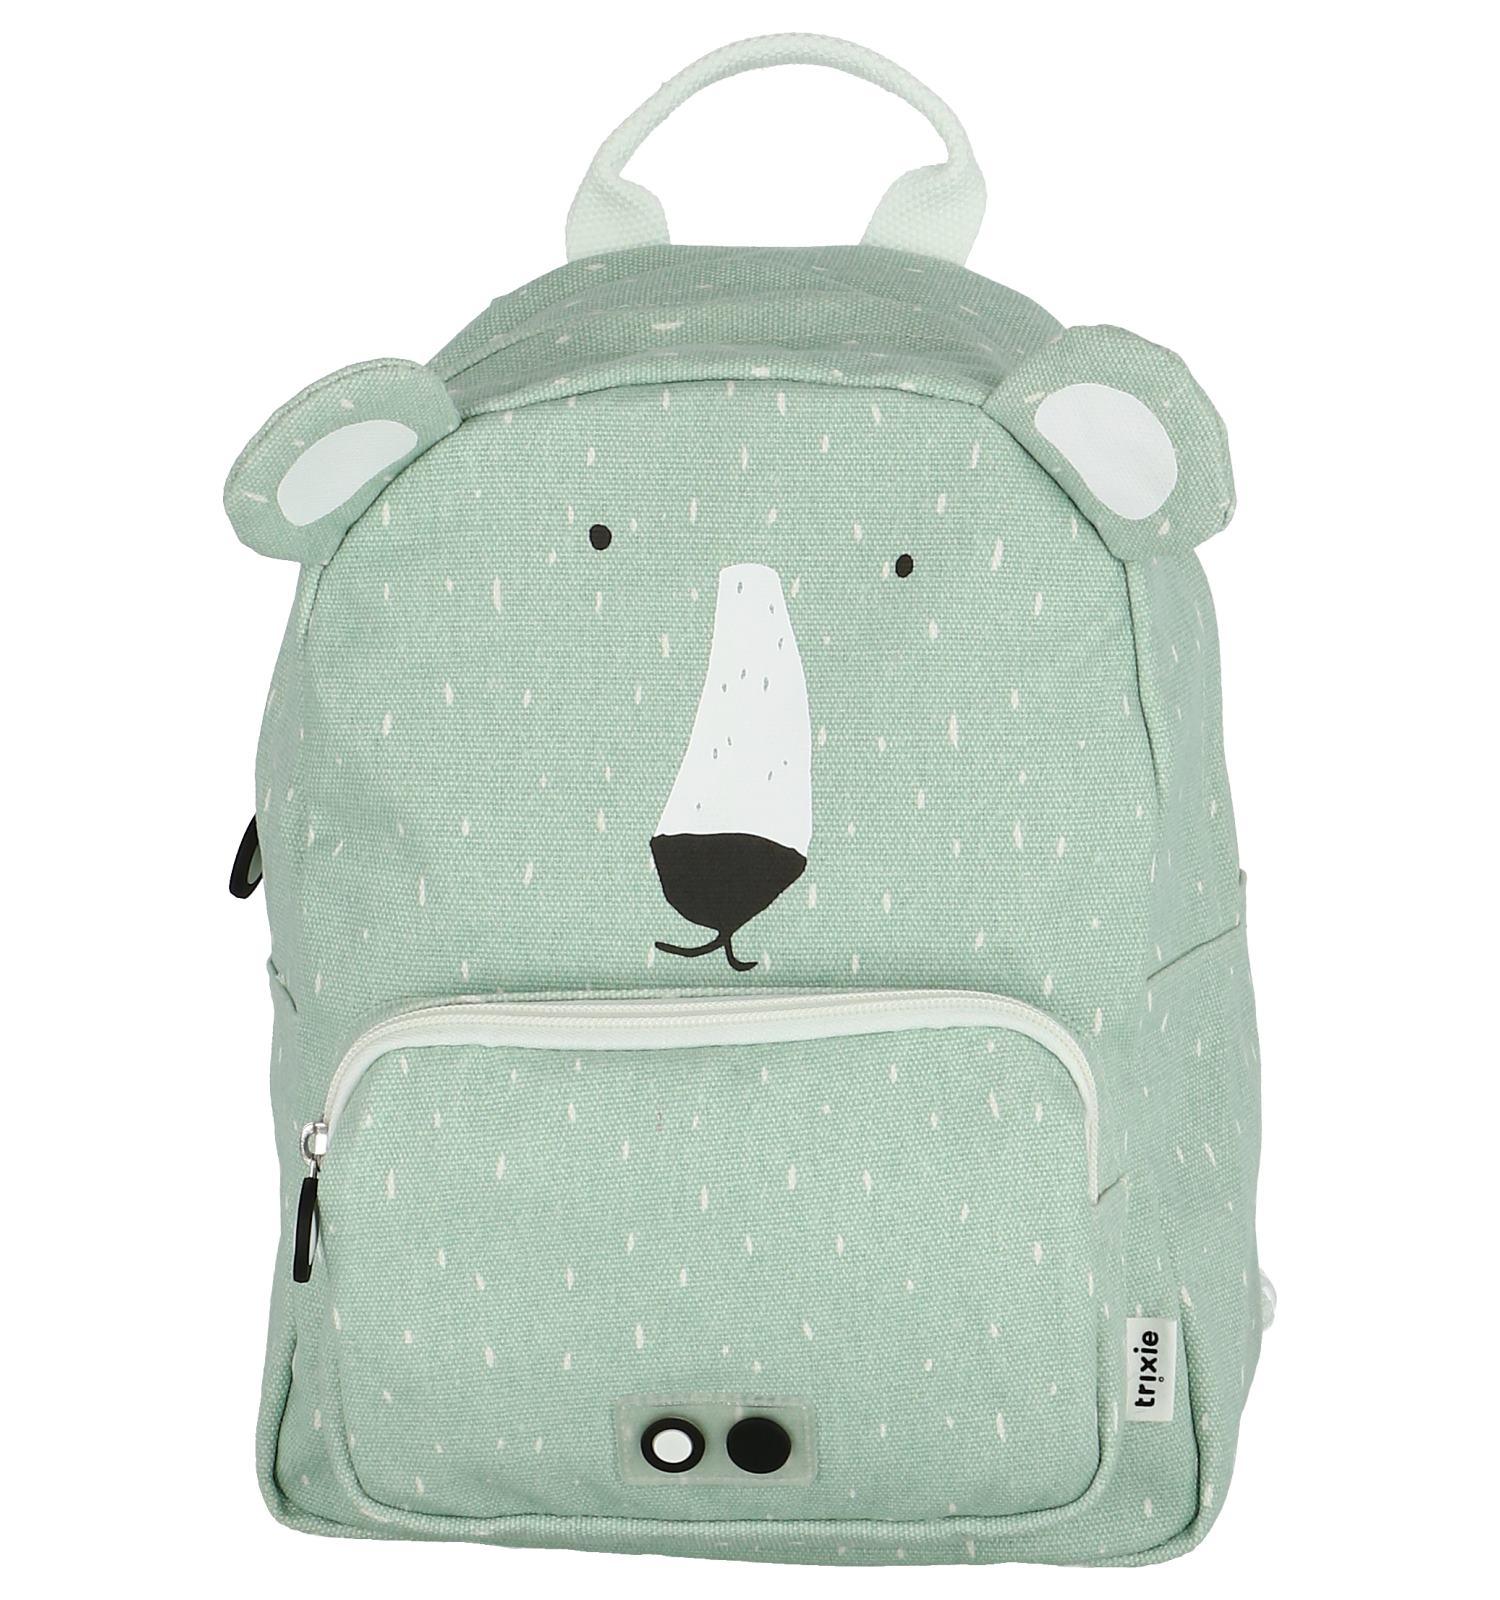 3b48435ad80 Muntgroene Rugzak Trixie Mr. Polar Bear | TORFS.BE | Gratis verzend en  retour